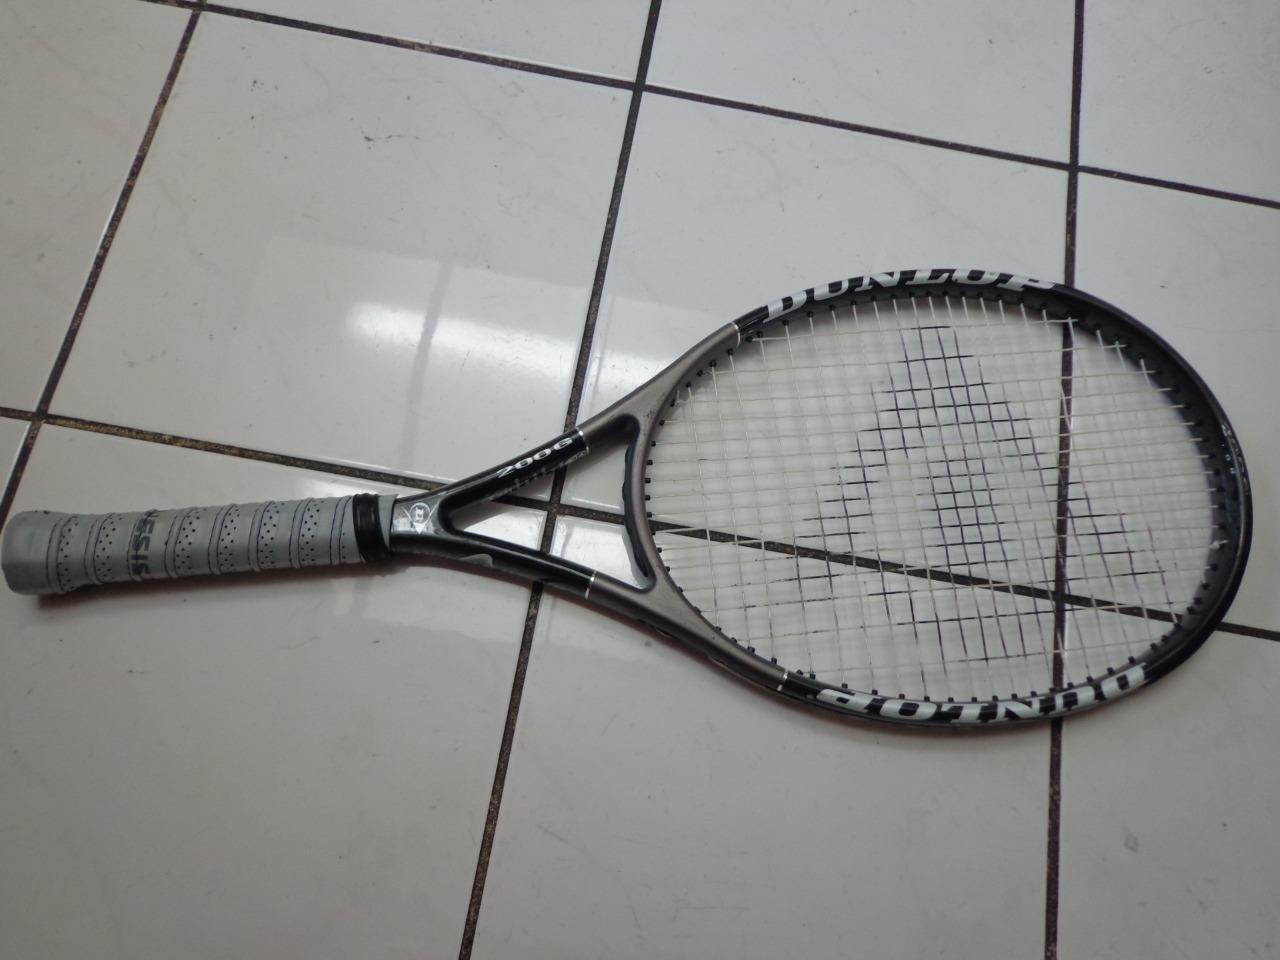 Tejido muscular gran Dunlop 108 cabeza de gran muscular tamaño 4 3/8 de Agarre Tenis Raqueta 766170